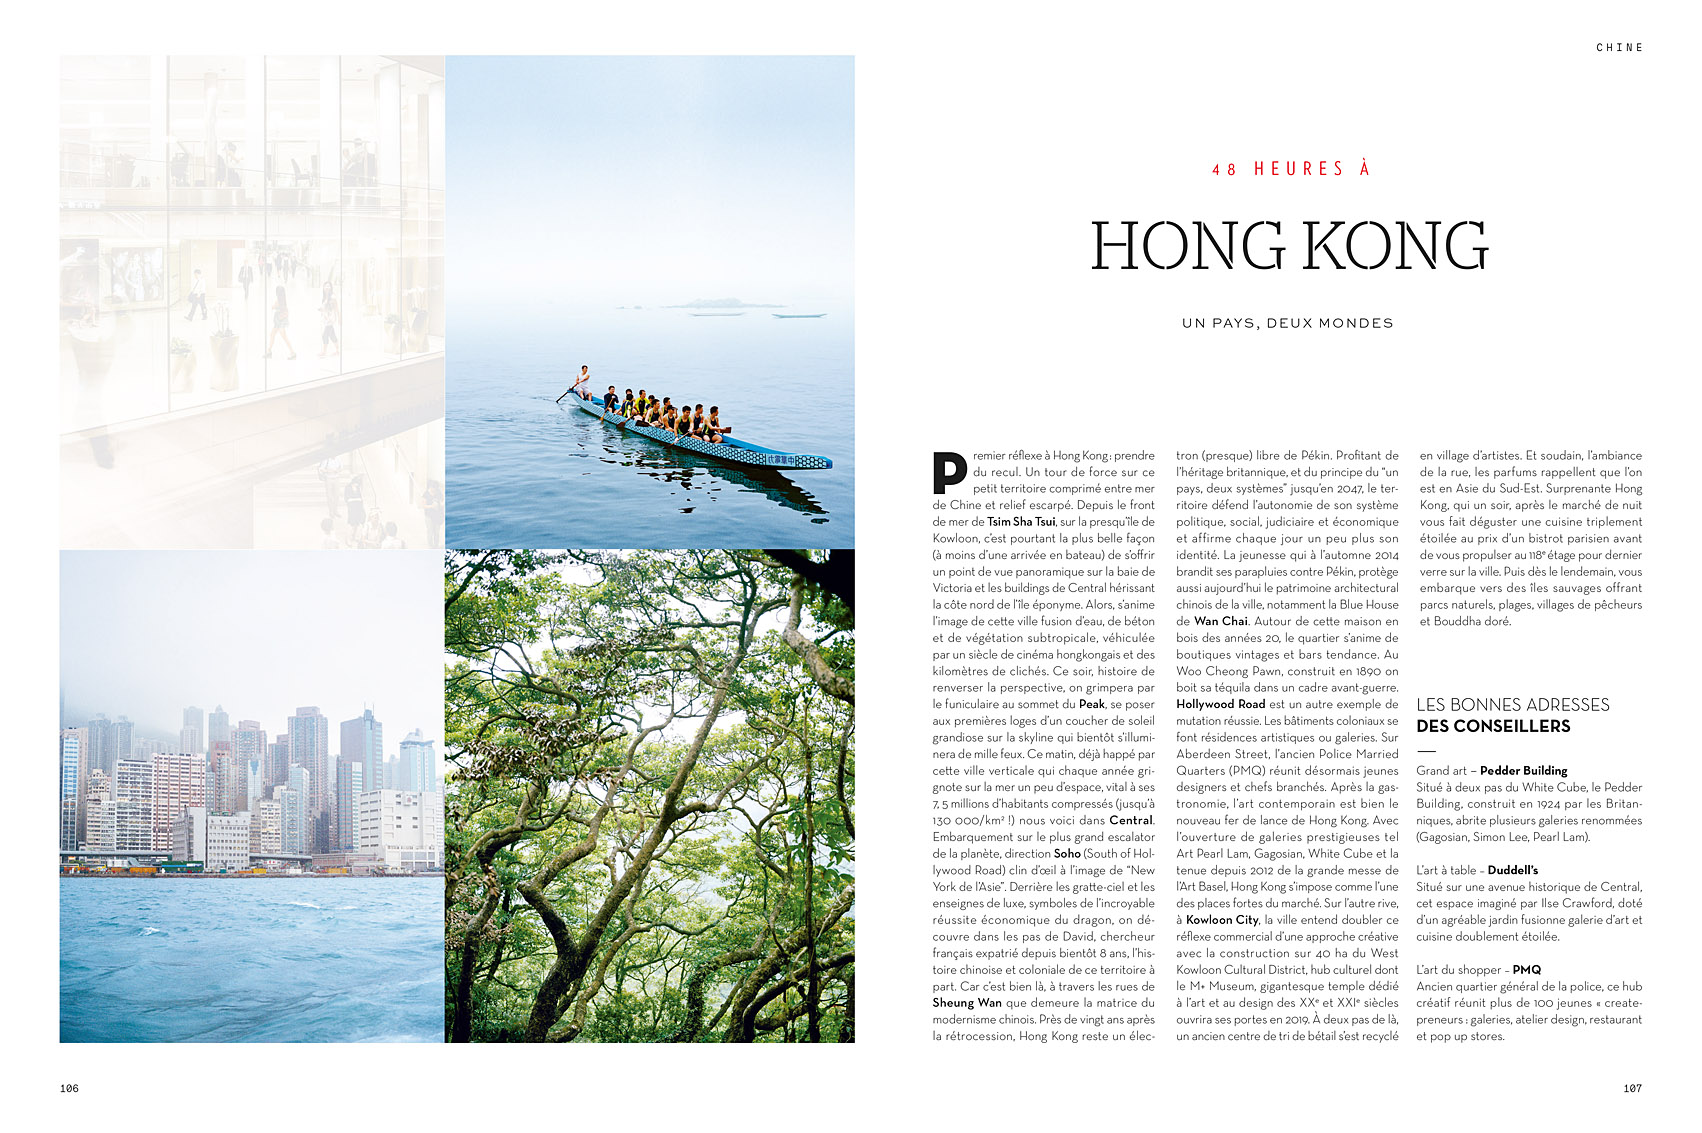 Hong Kong, Voyageurs du Monde brochure Asie